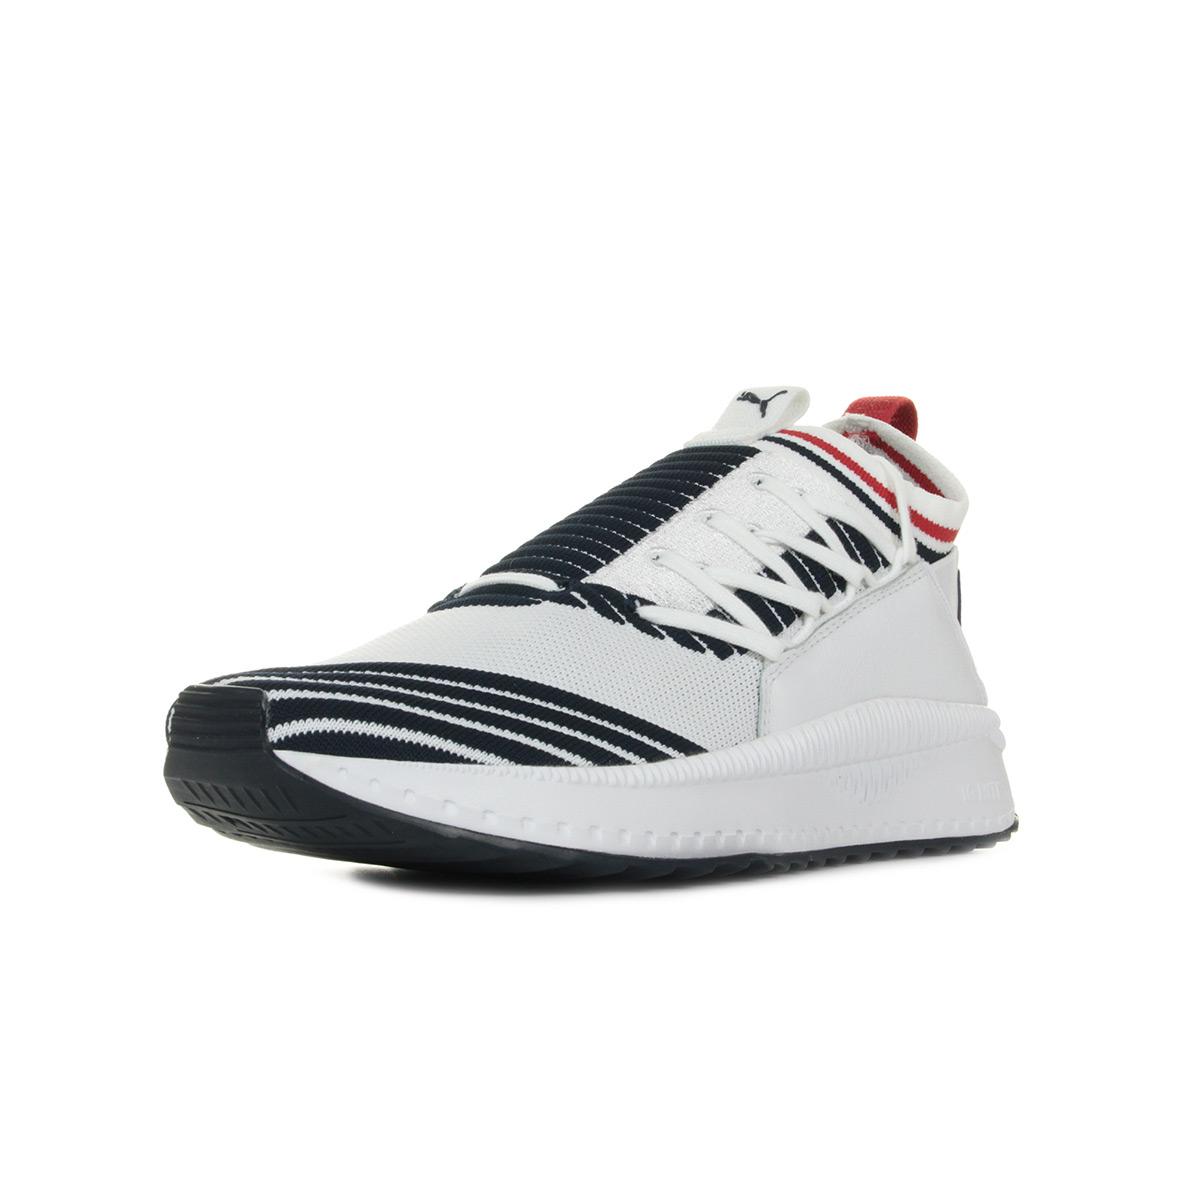 Puma Tsugi Sport 36751901 Jun Mode Stripes Baskets Homme rrq7dZ